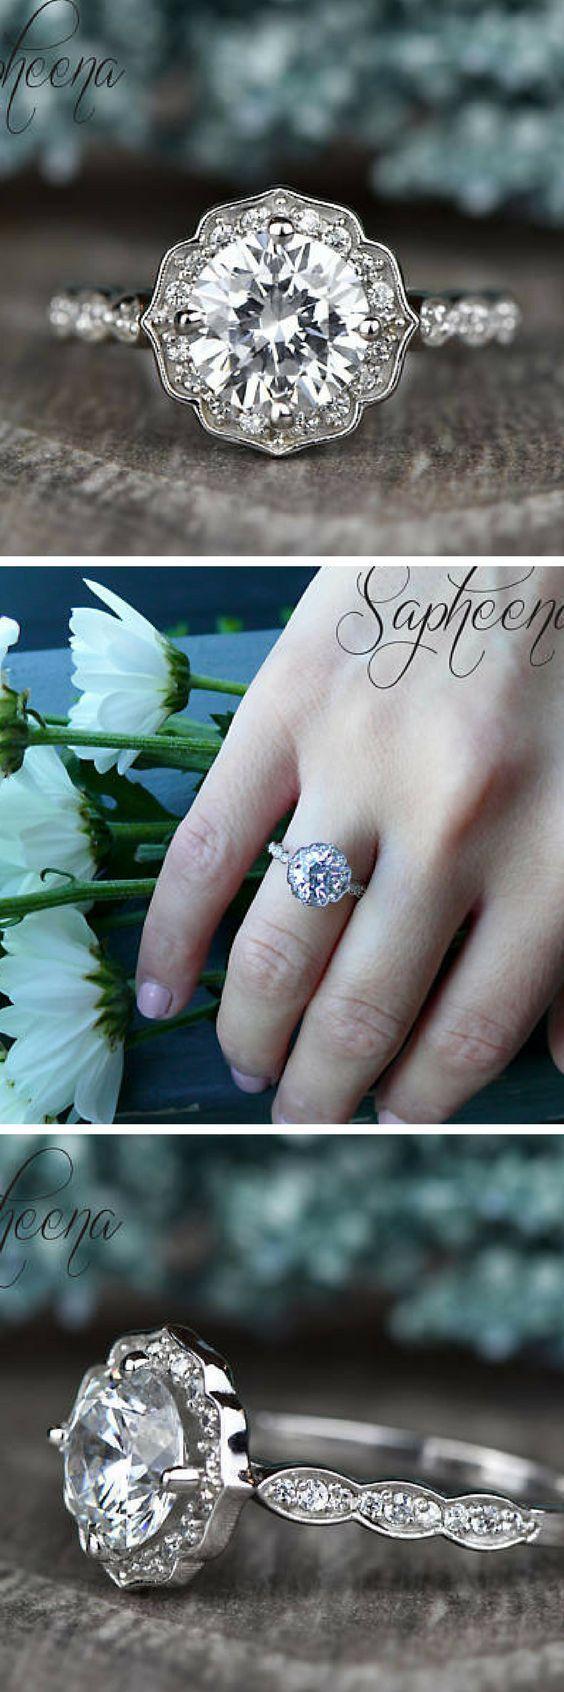 Moissanite Round Vintage Floral Engagement Ring in 14k White Gold, Bridal Ring,7mm Round Moissanite Promise Ring,Wedding Ring by Sapheena. #wedding #affiliate #engagement #etsy #ring #weddingring